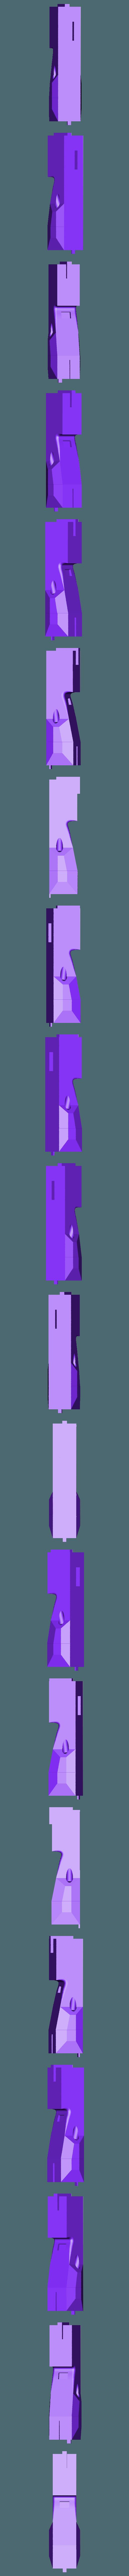 STL_S5_v20_Main_Bottom_.stl Download free STL file Star Wars Naboo S5 Heavy Blaster Pistol • 3D printing design, Dsk